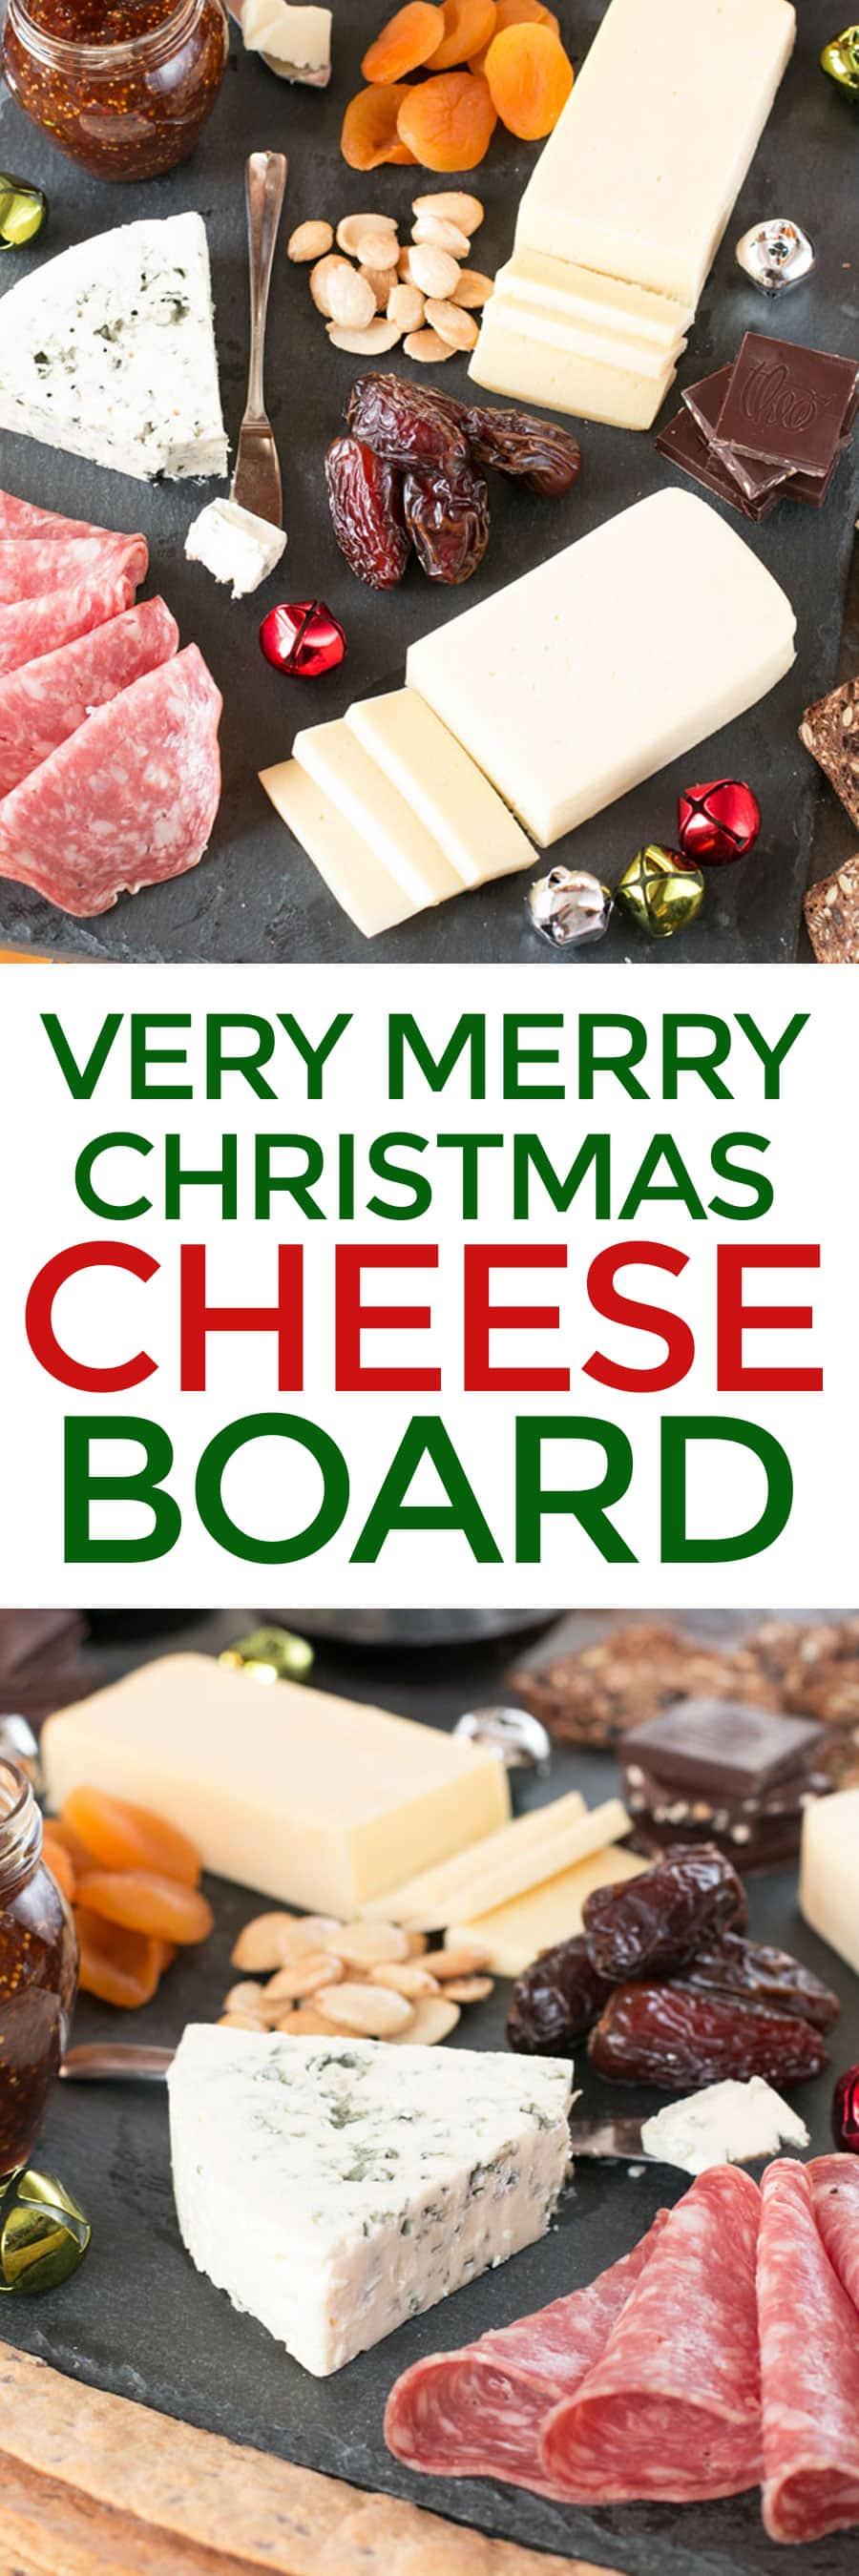 Very Merry Christmas Cheese Board | cakenknife.com